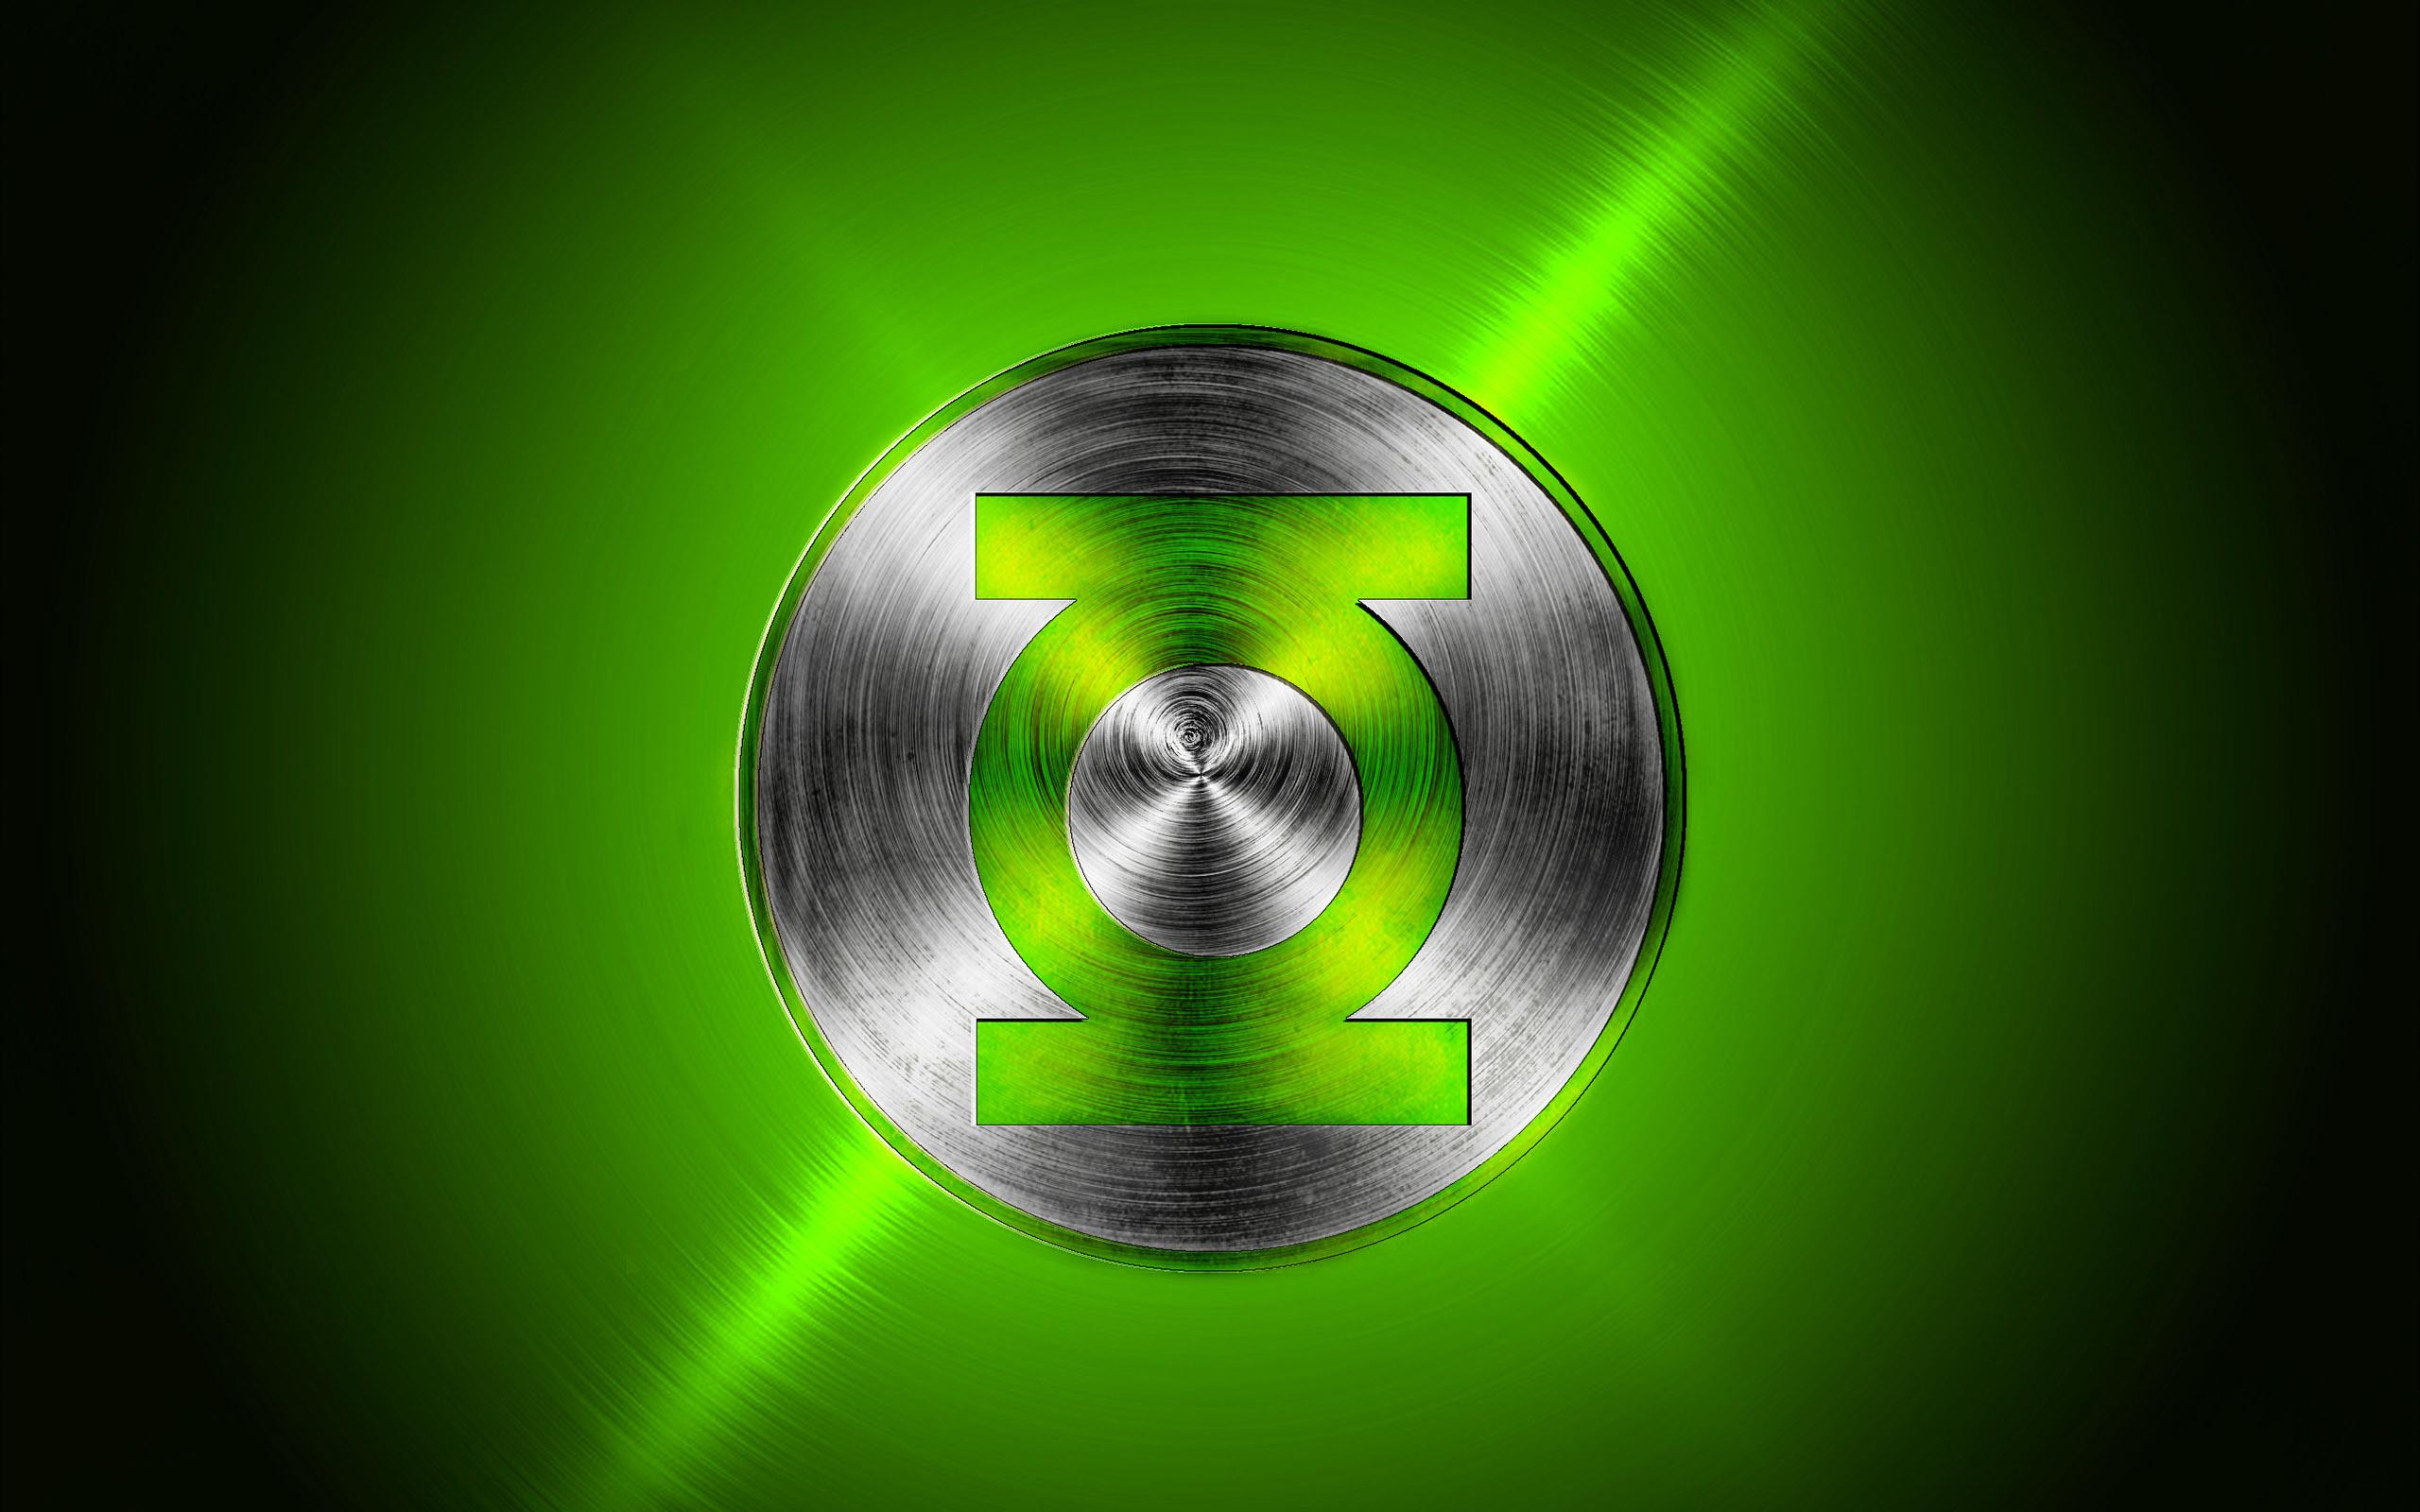 Green Lantern Symbol WP by MorganRLewis on DeviantArt